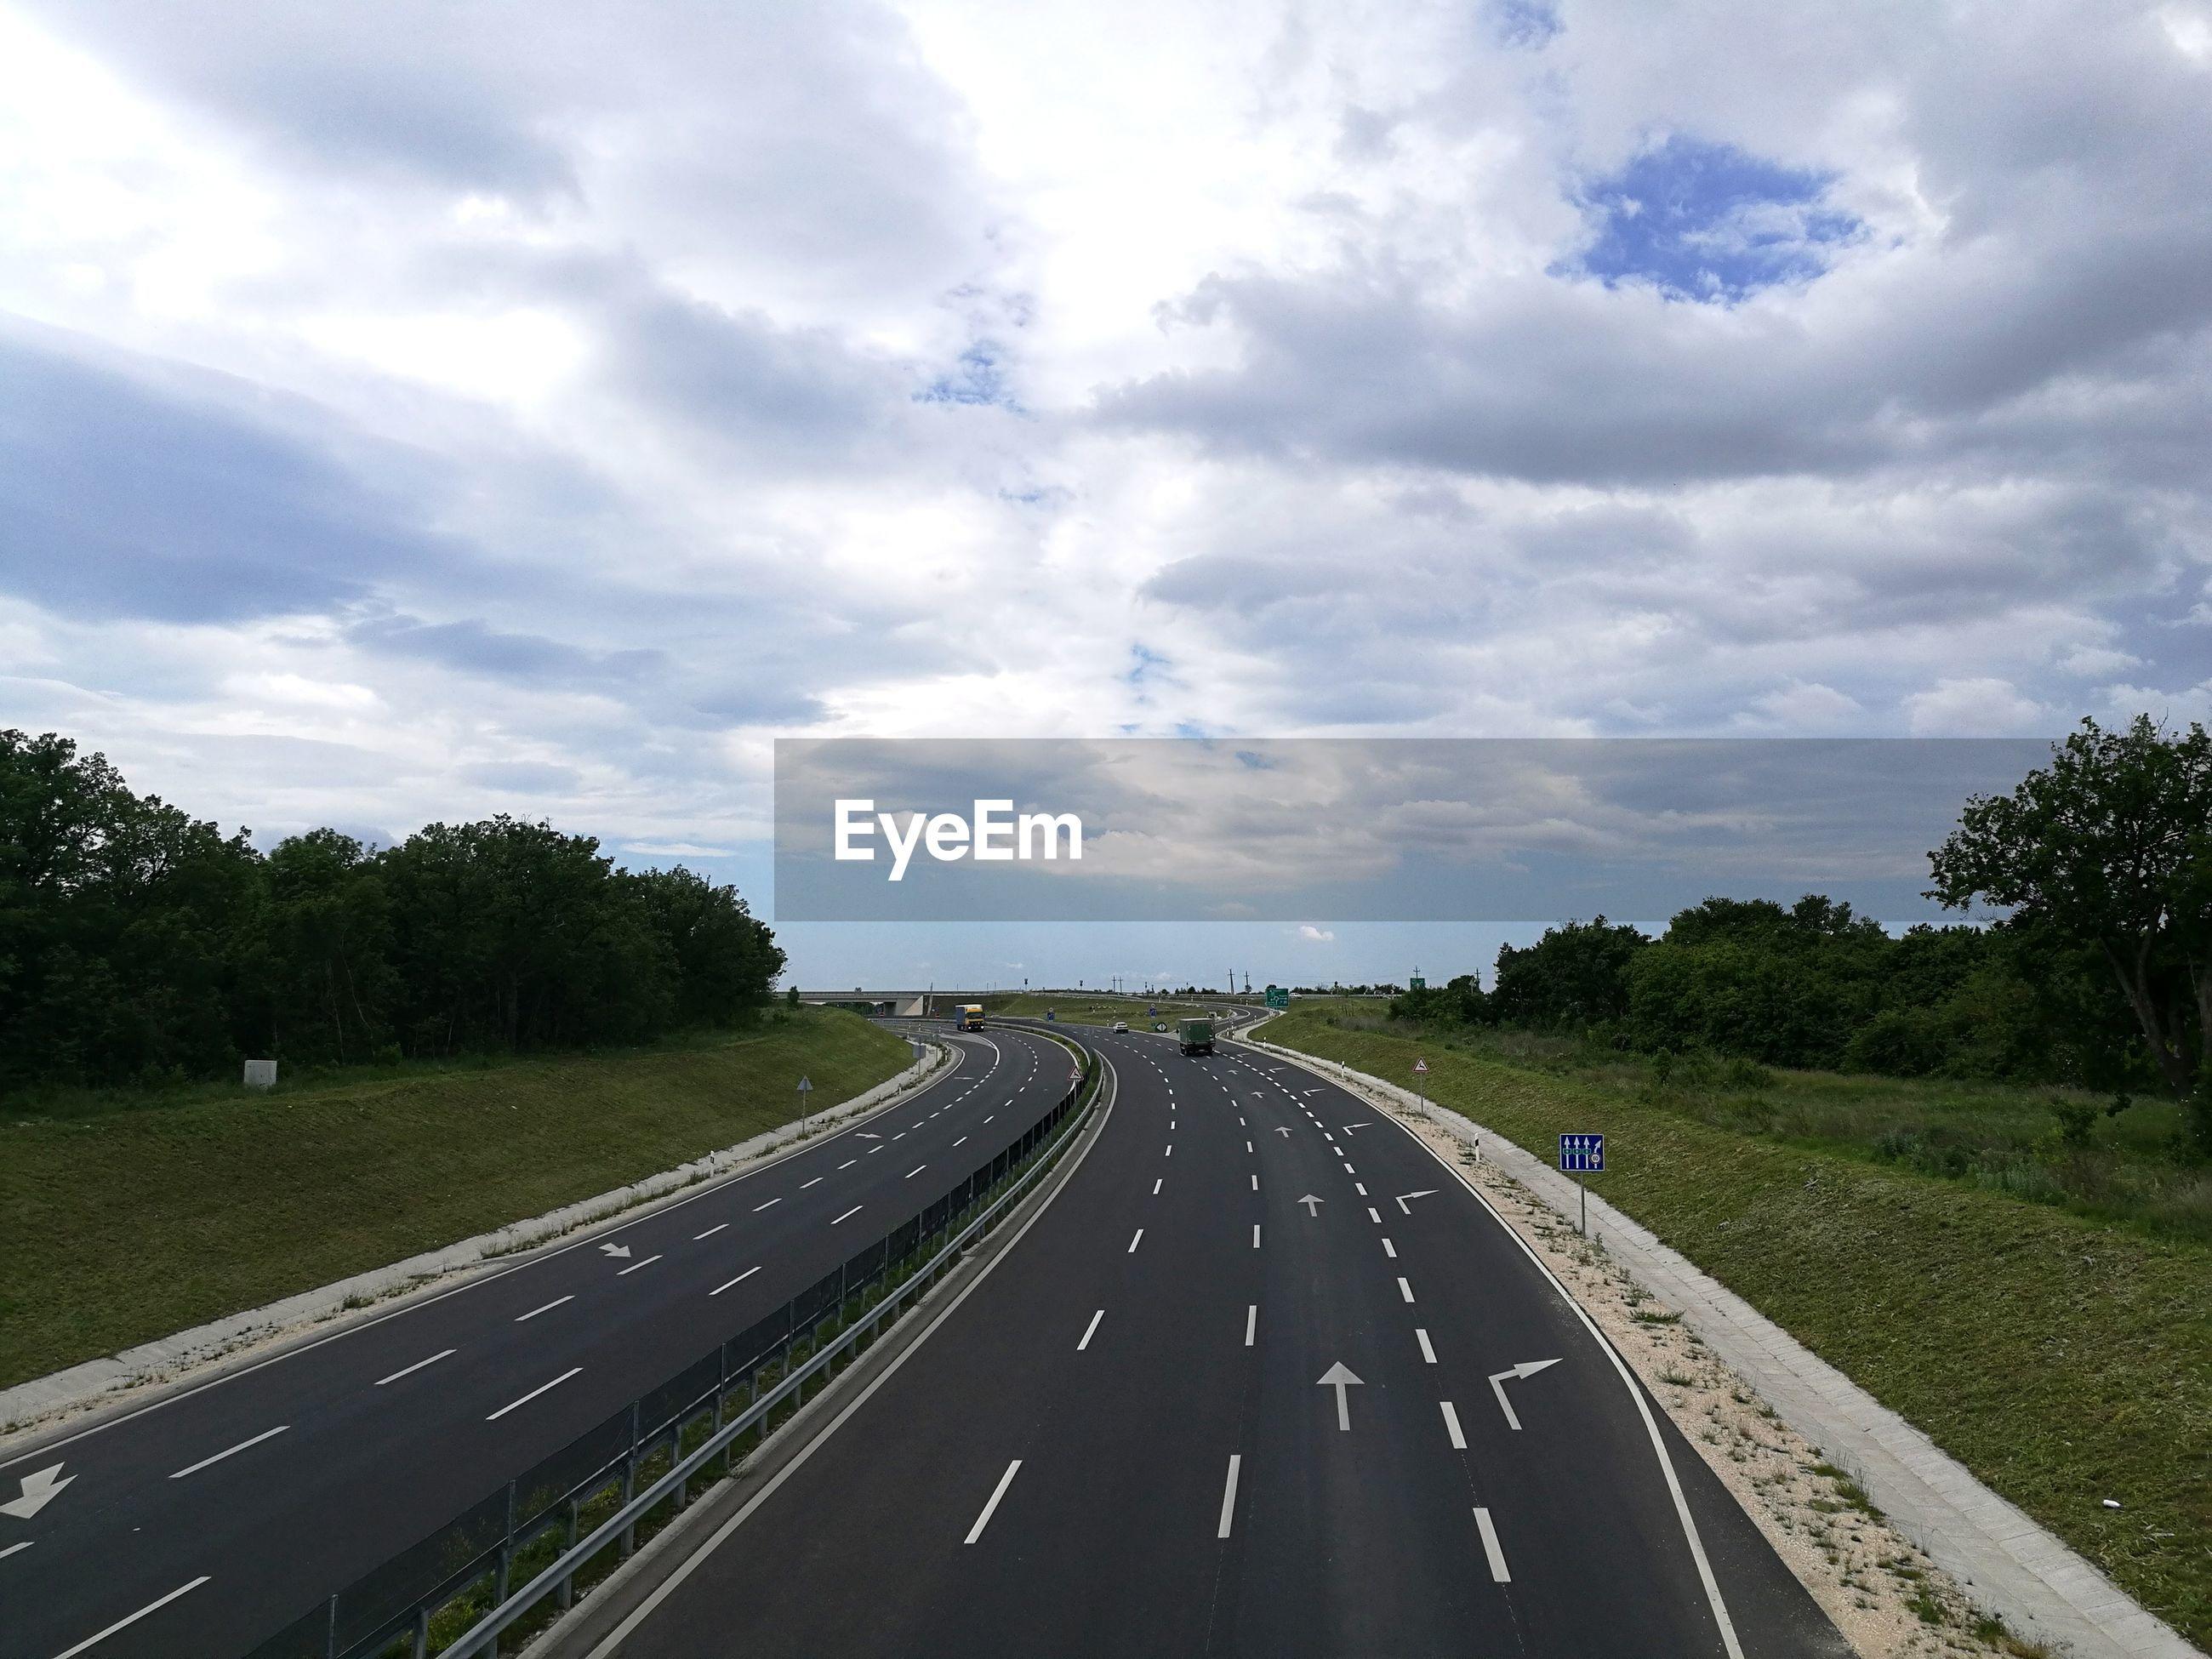 Highway by road against sky